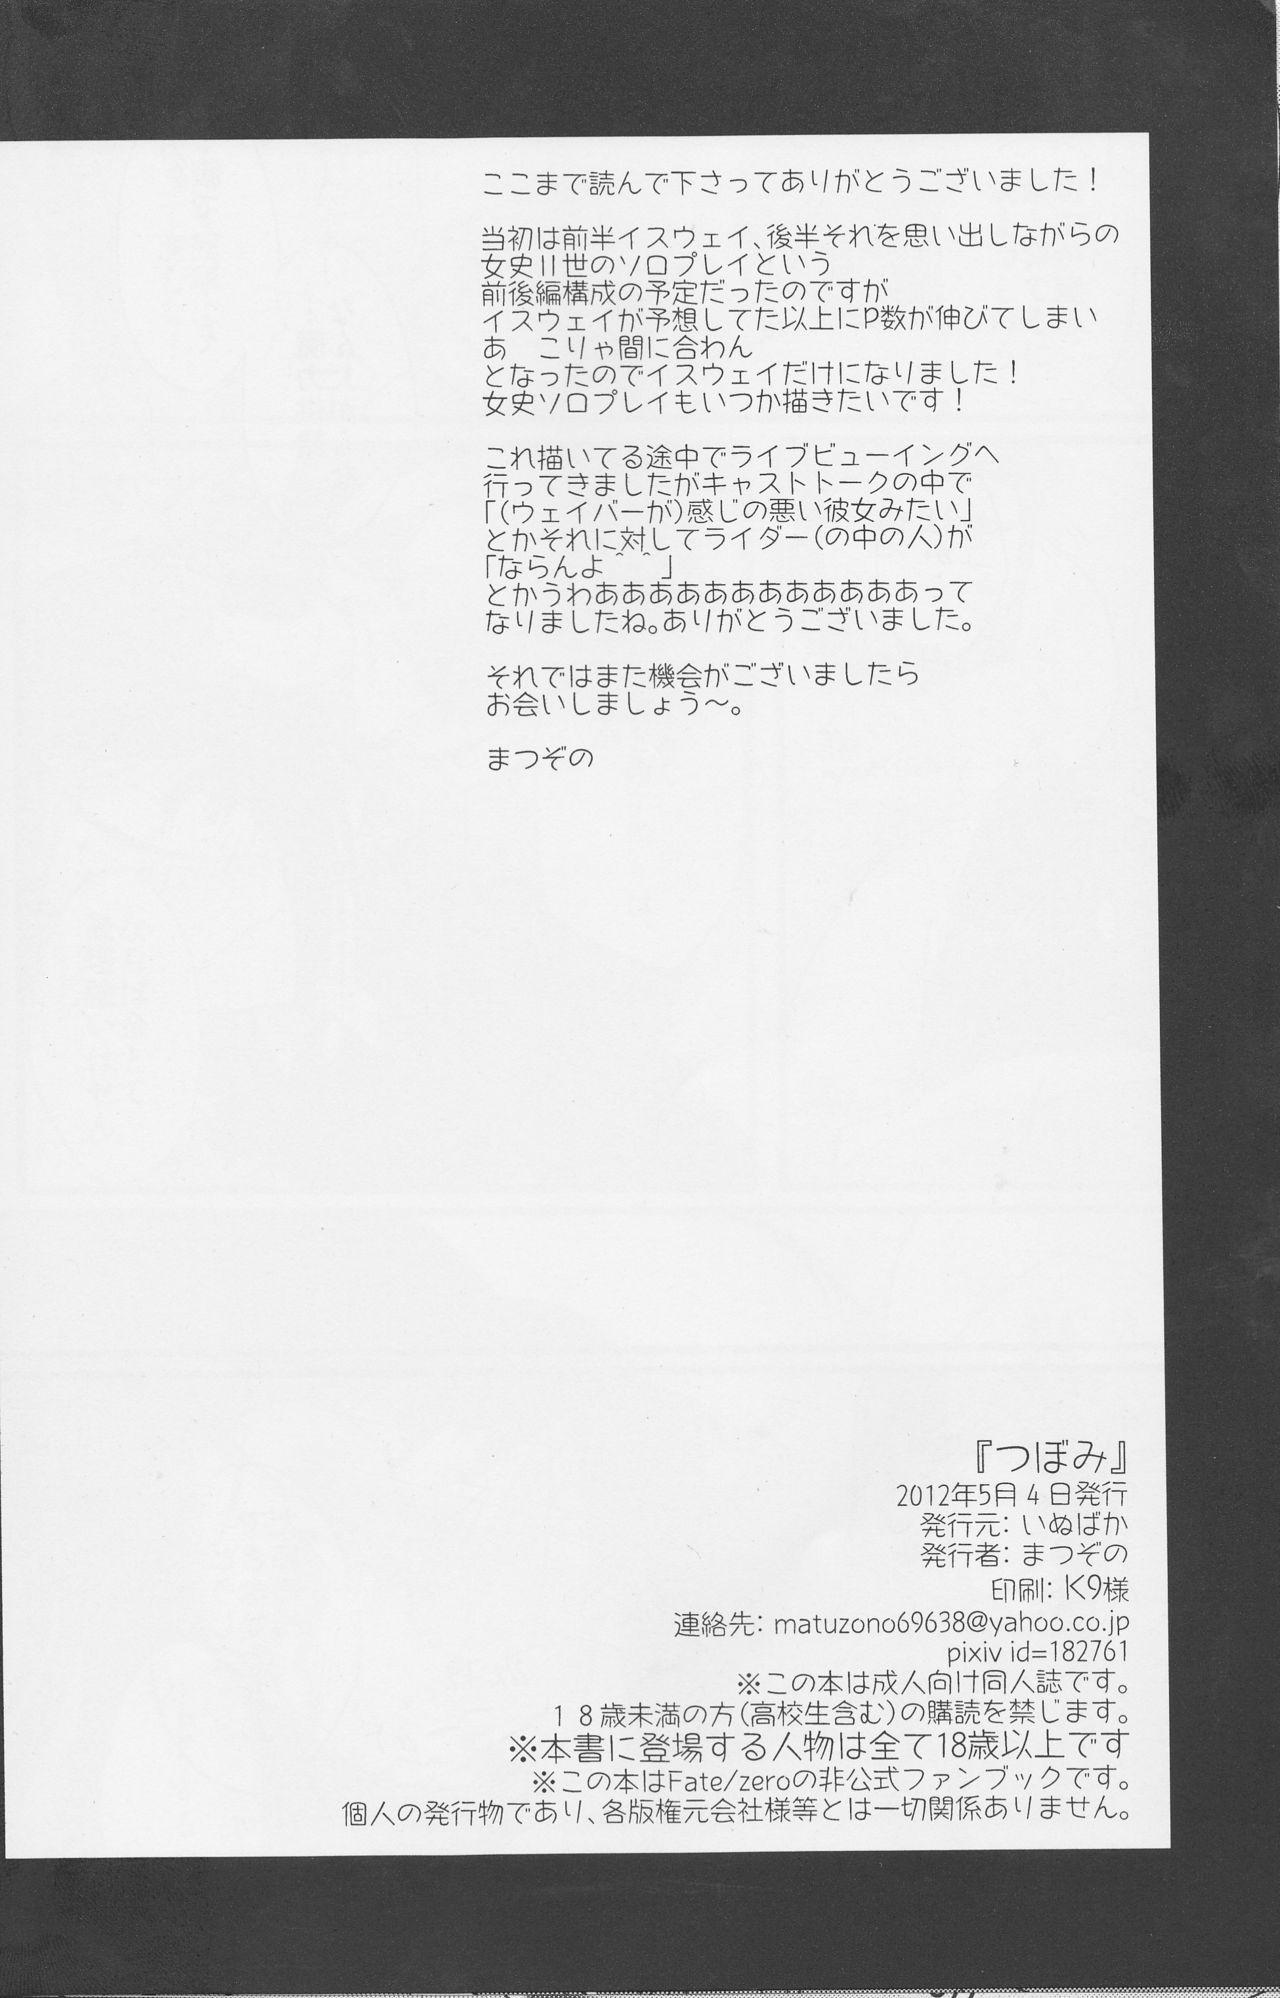 Tsubomi 29